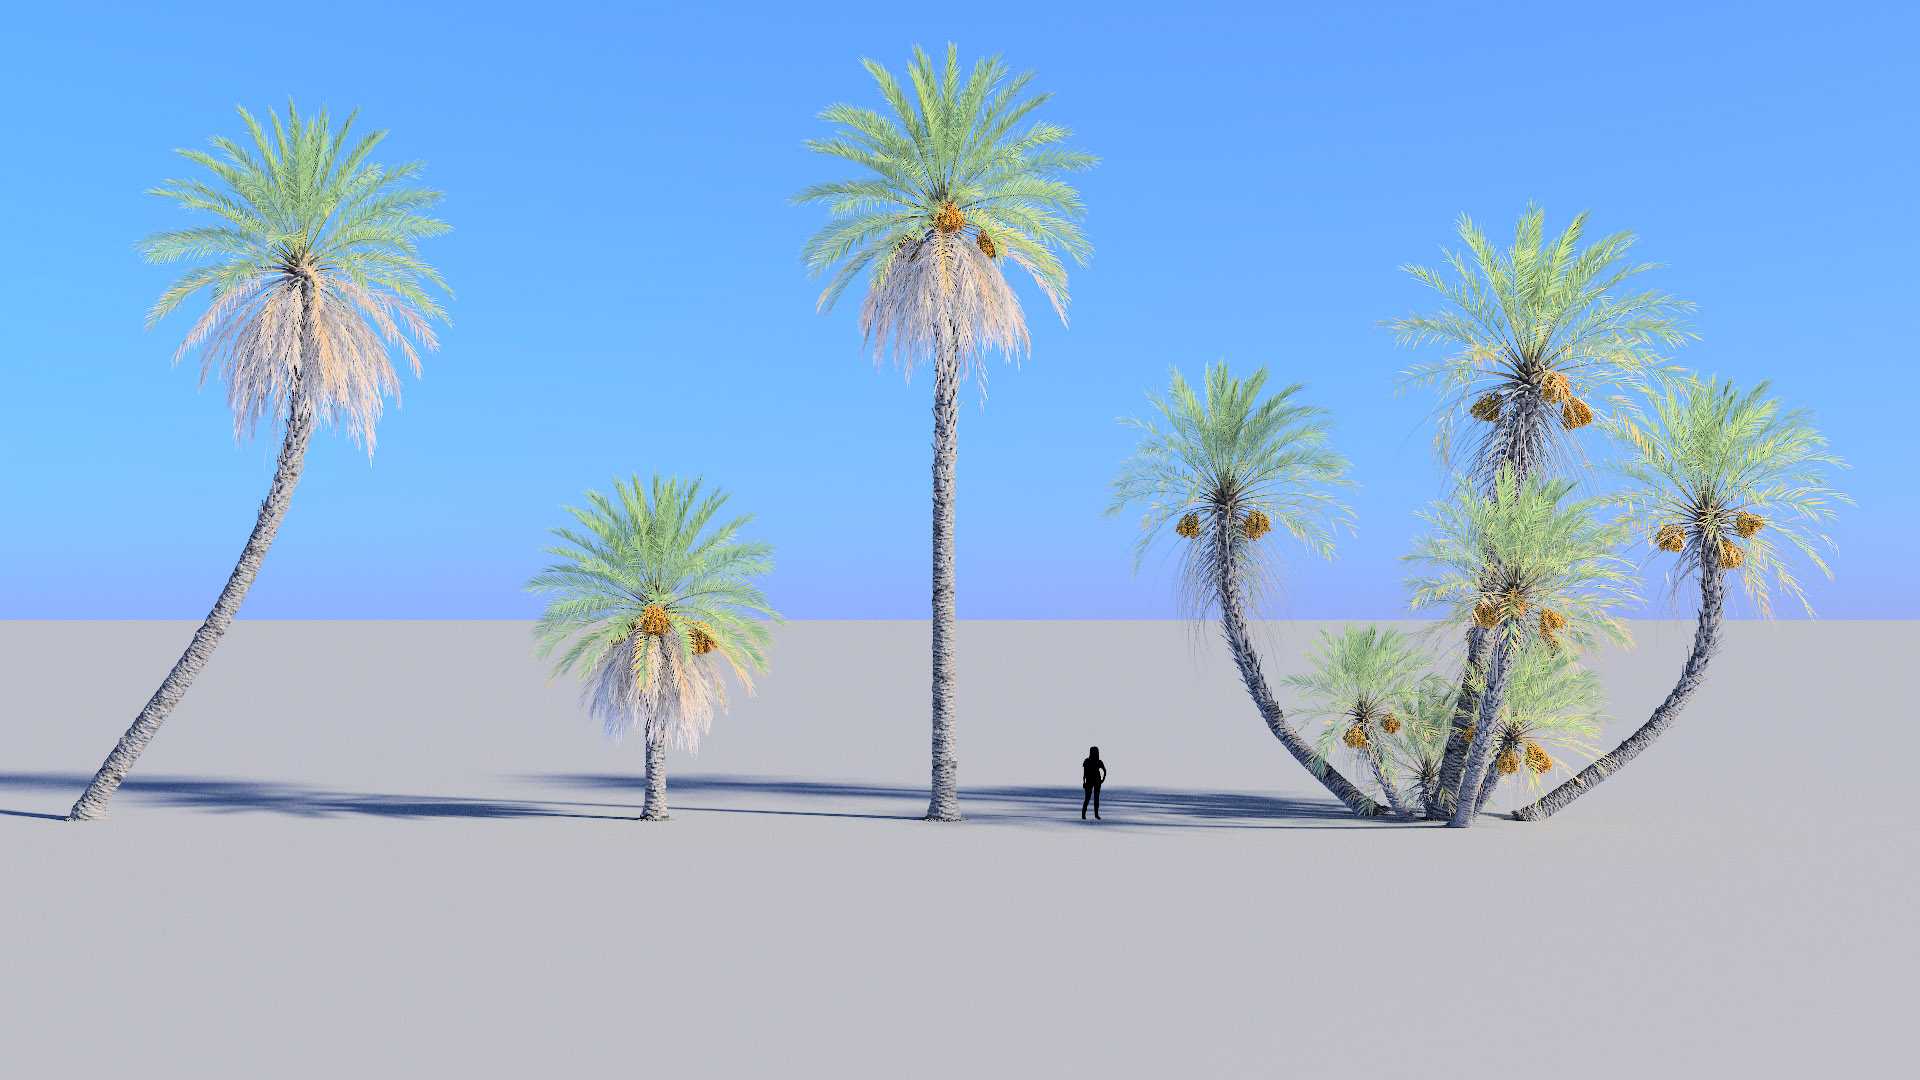 3D model of the Date palm Phoenix dactylifera